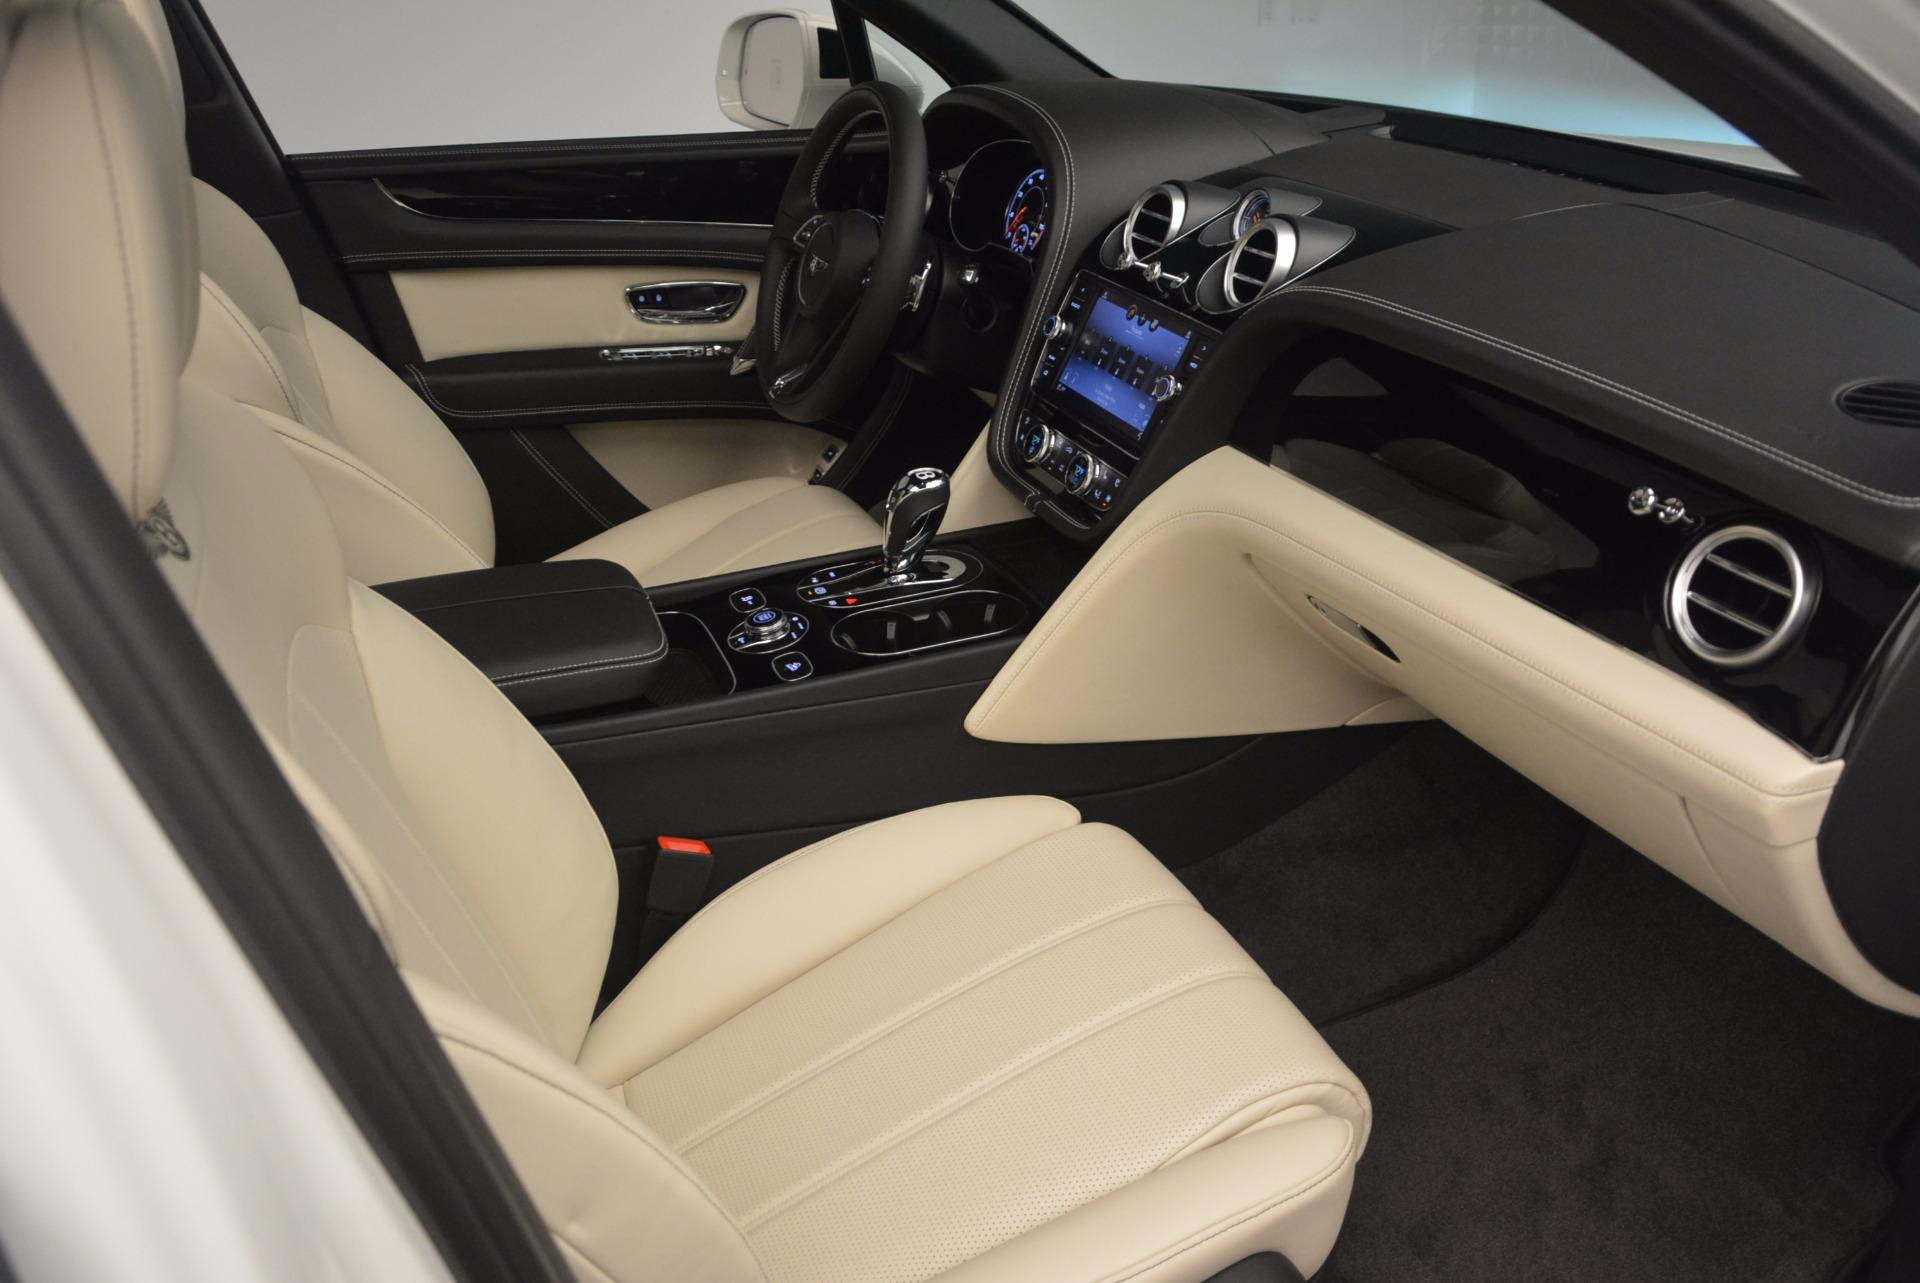 Used 2018 Bentley Bentayga Onyx For Sale In Greenwich, CT. Alfa Romeo of Greenwich, 7485 1549_p27